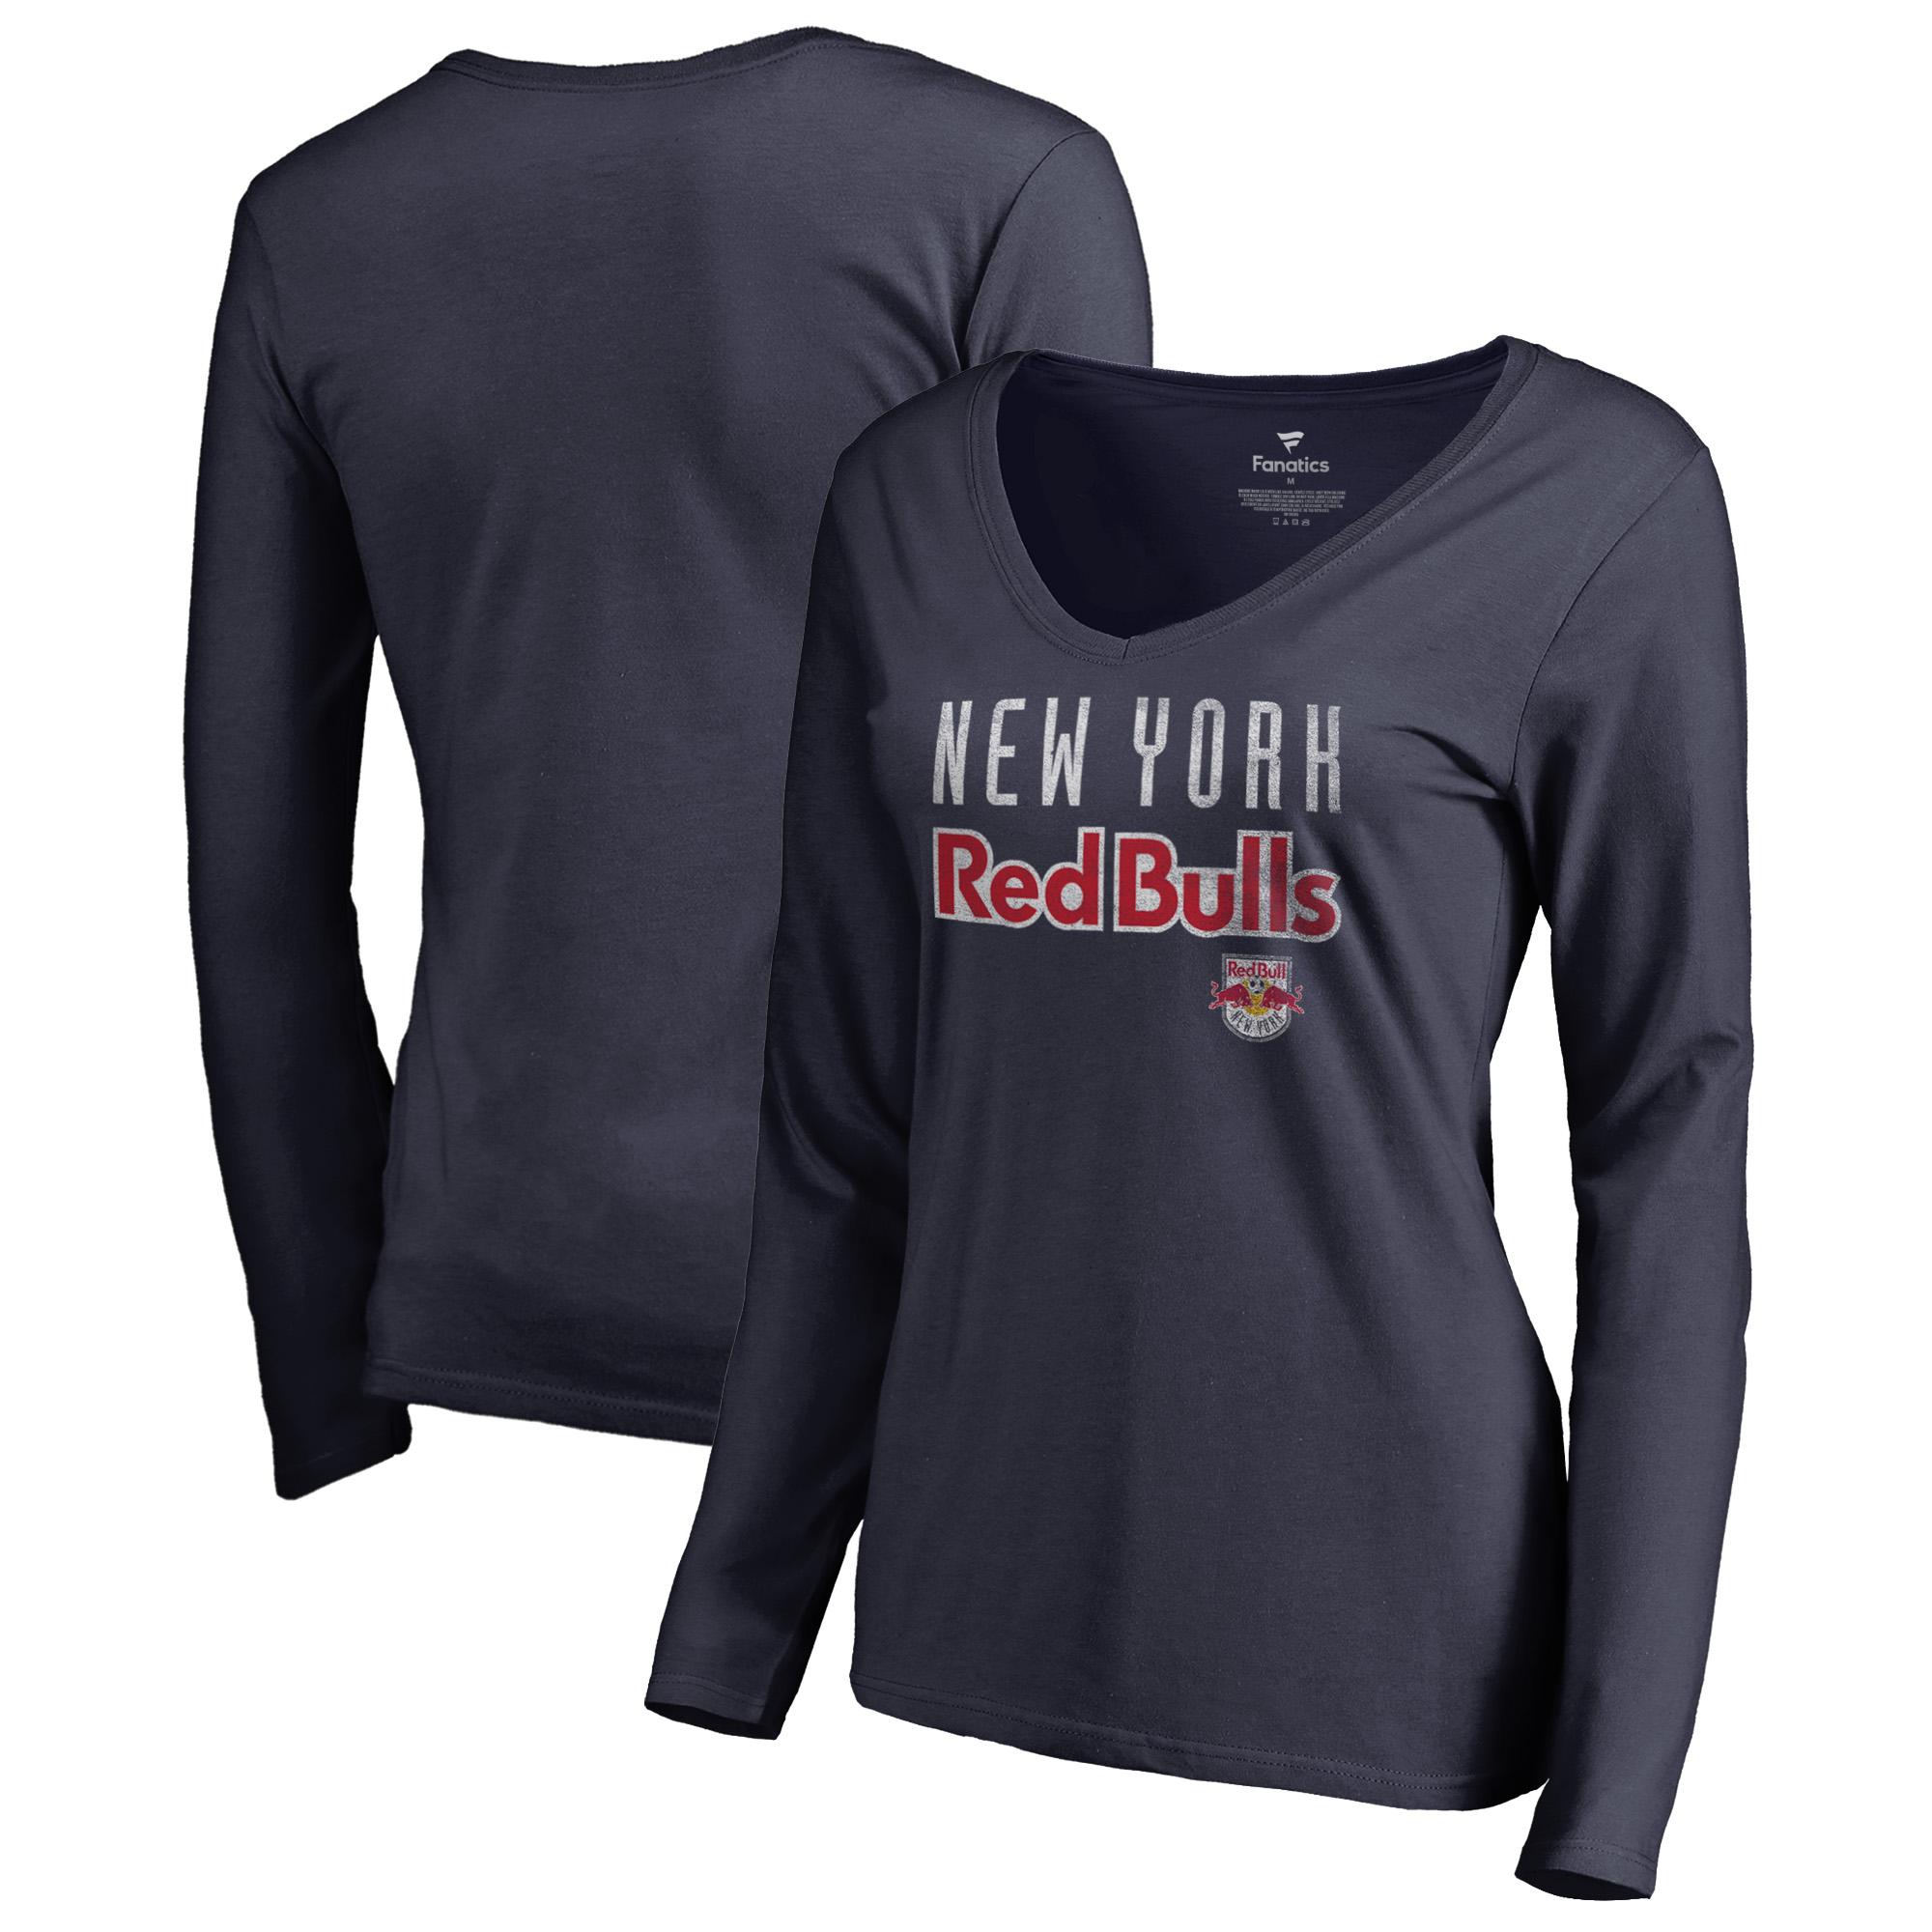 New York Red Bulls Fanatics Branded Women's Graceful V-Neck Long Sleeve T-Shirt - Navy